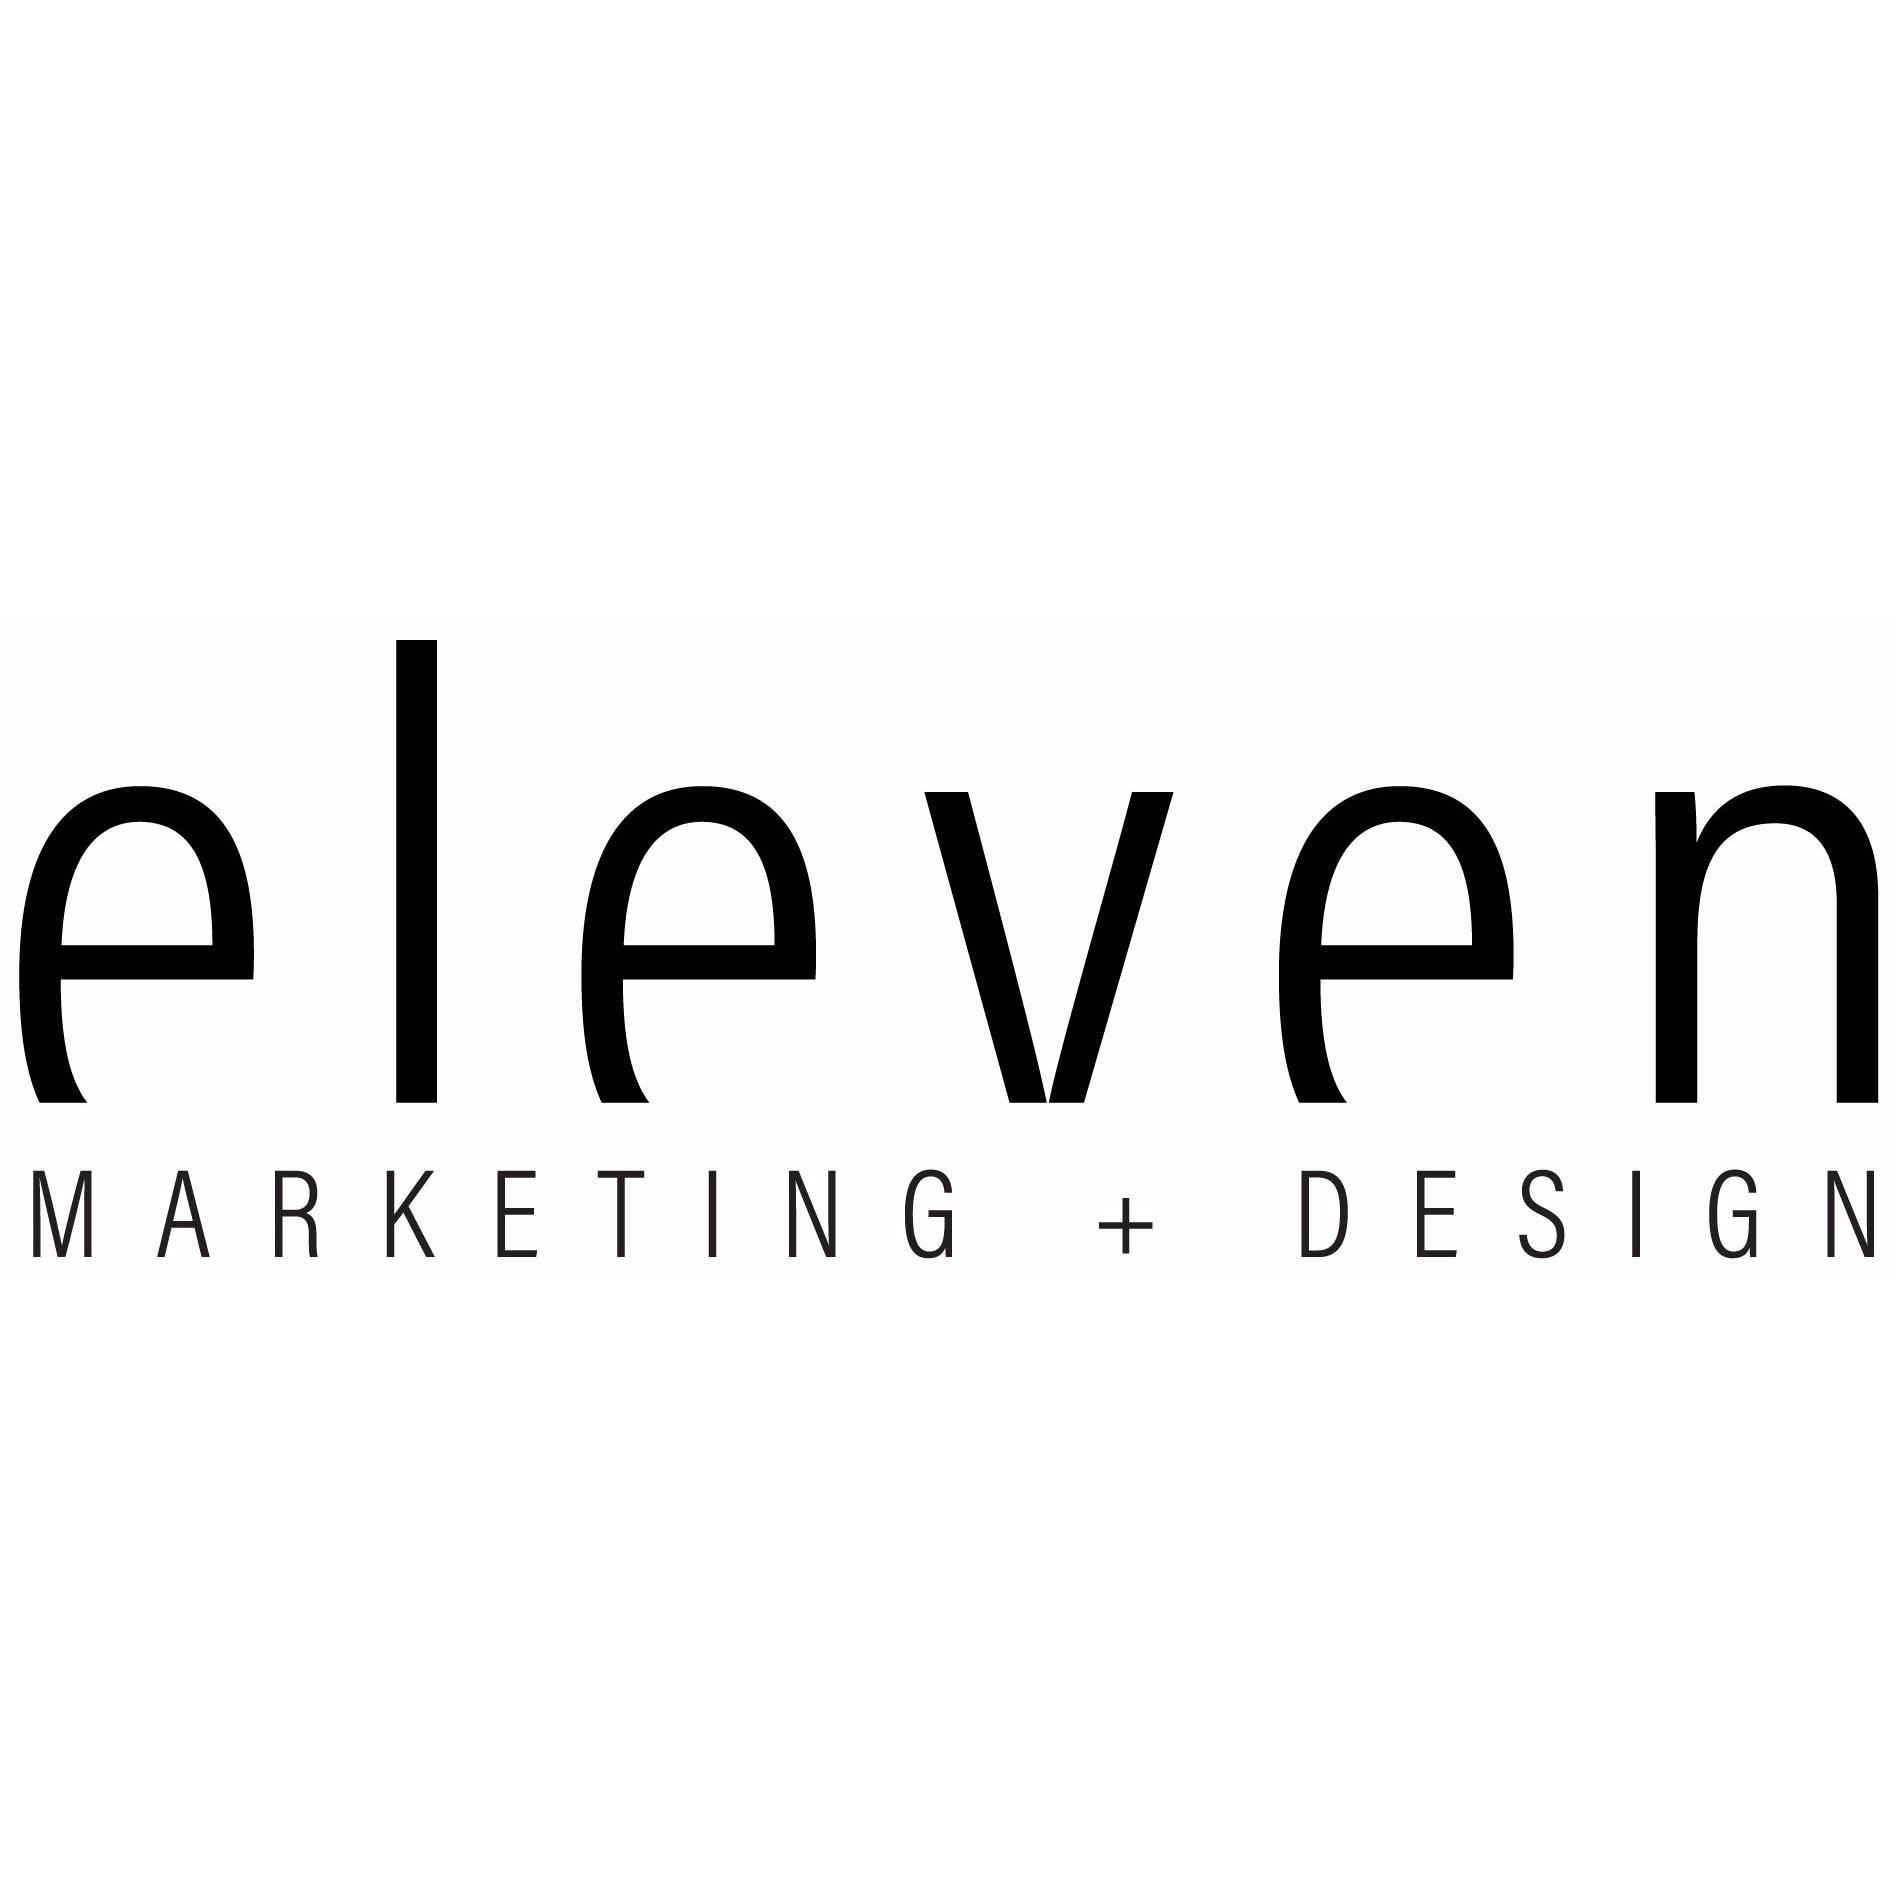 11 Marketing and Design